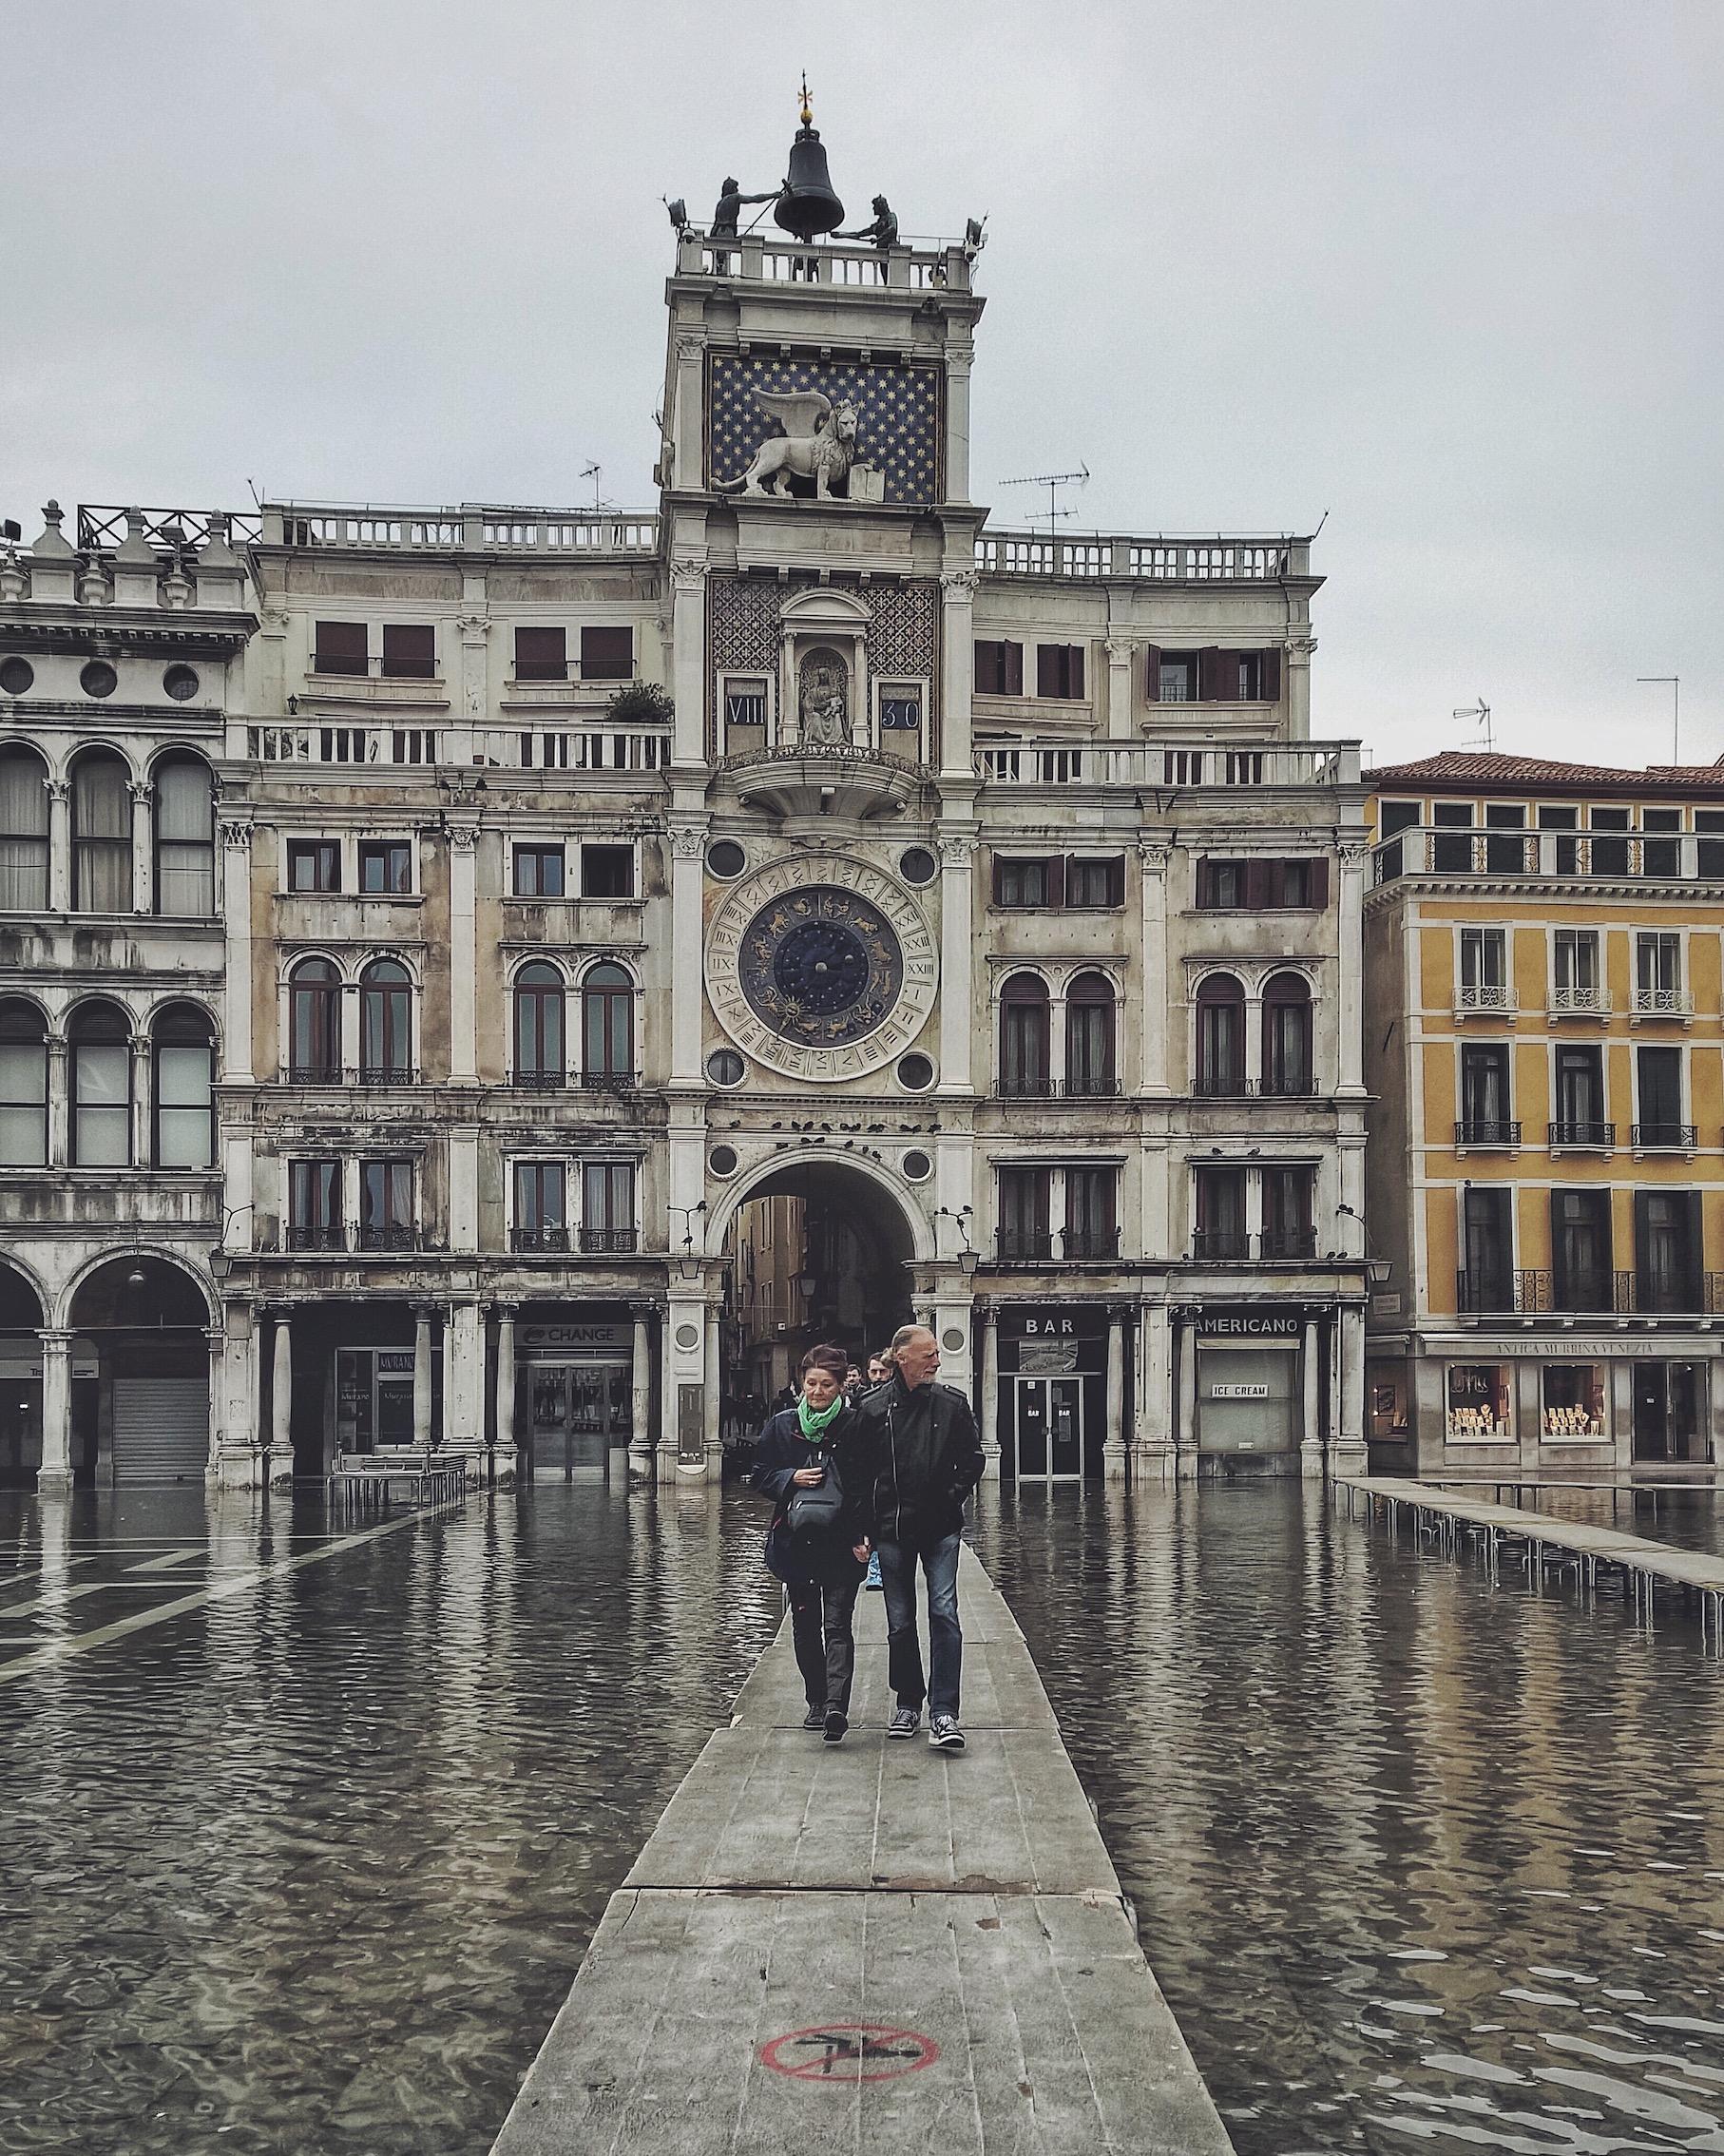 Copy of High tide in Venice